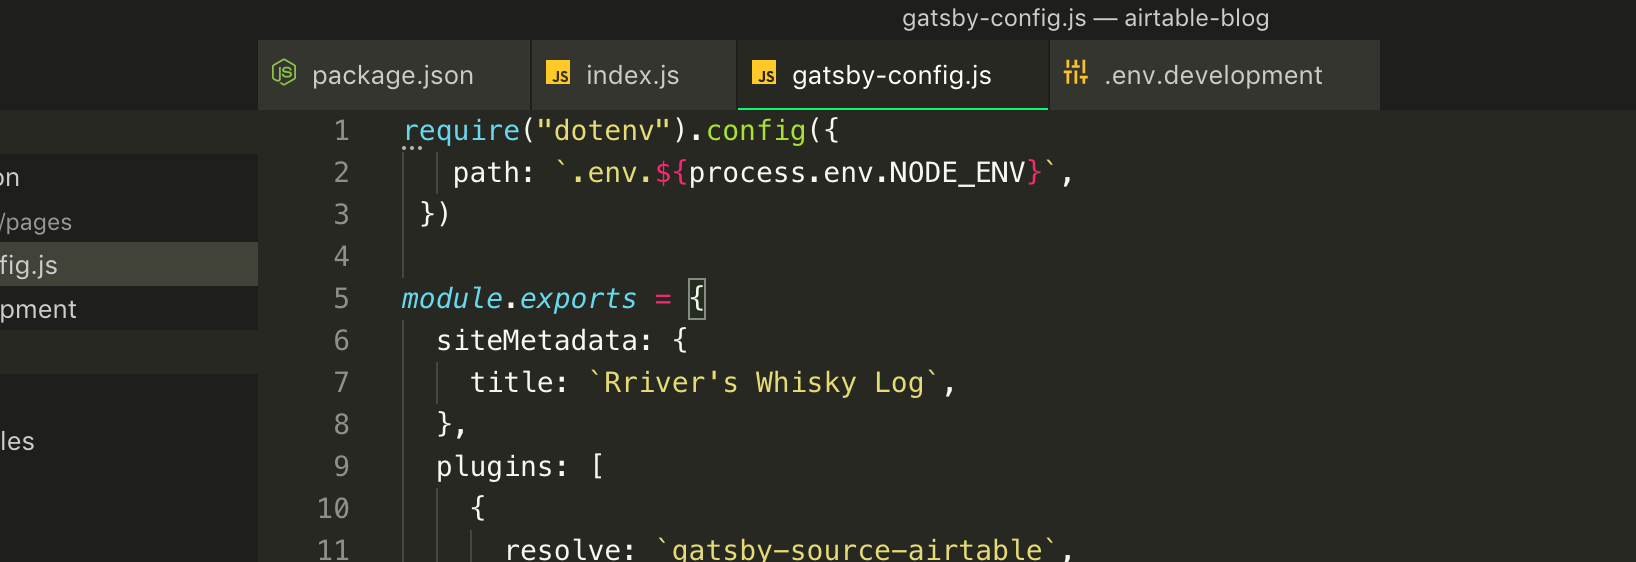 VSCodeのMonokaiテーマのタブ表示のカスタマイズをした画面